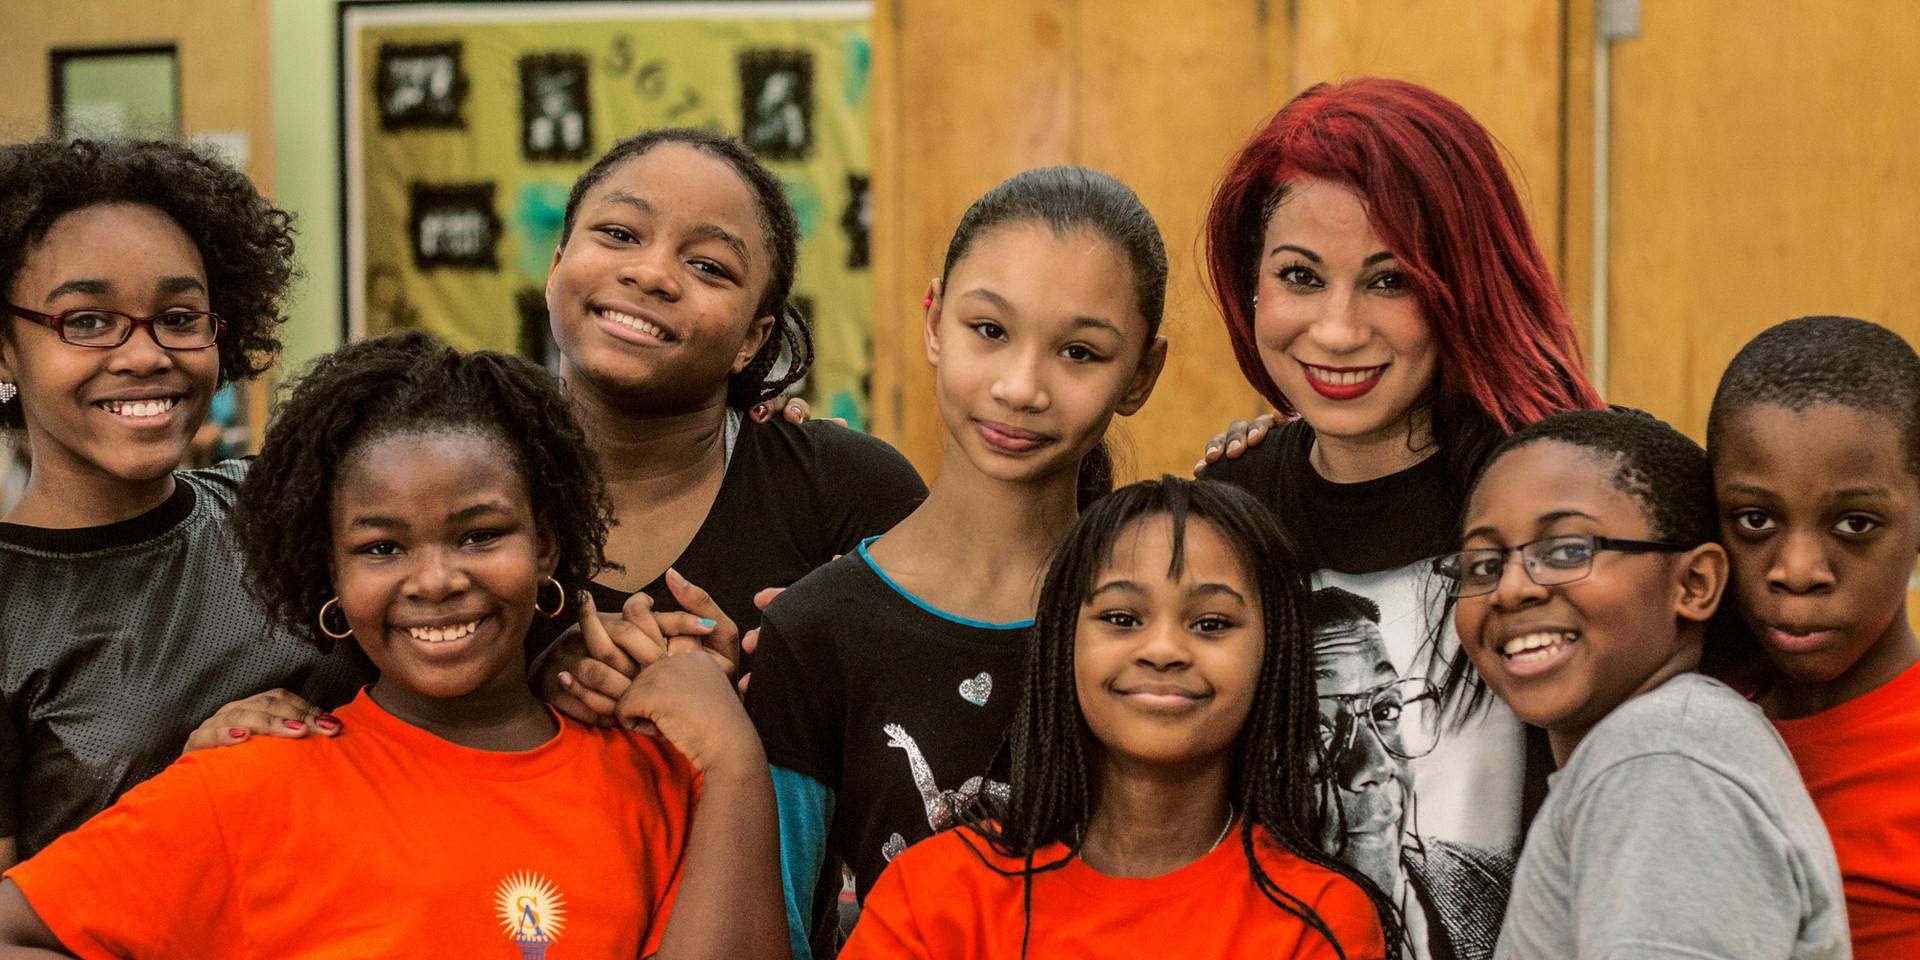 Group Pic Bronx Charter School Kids Smile ;)